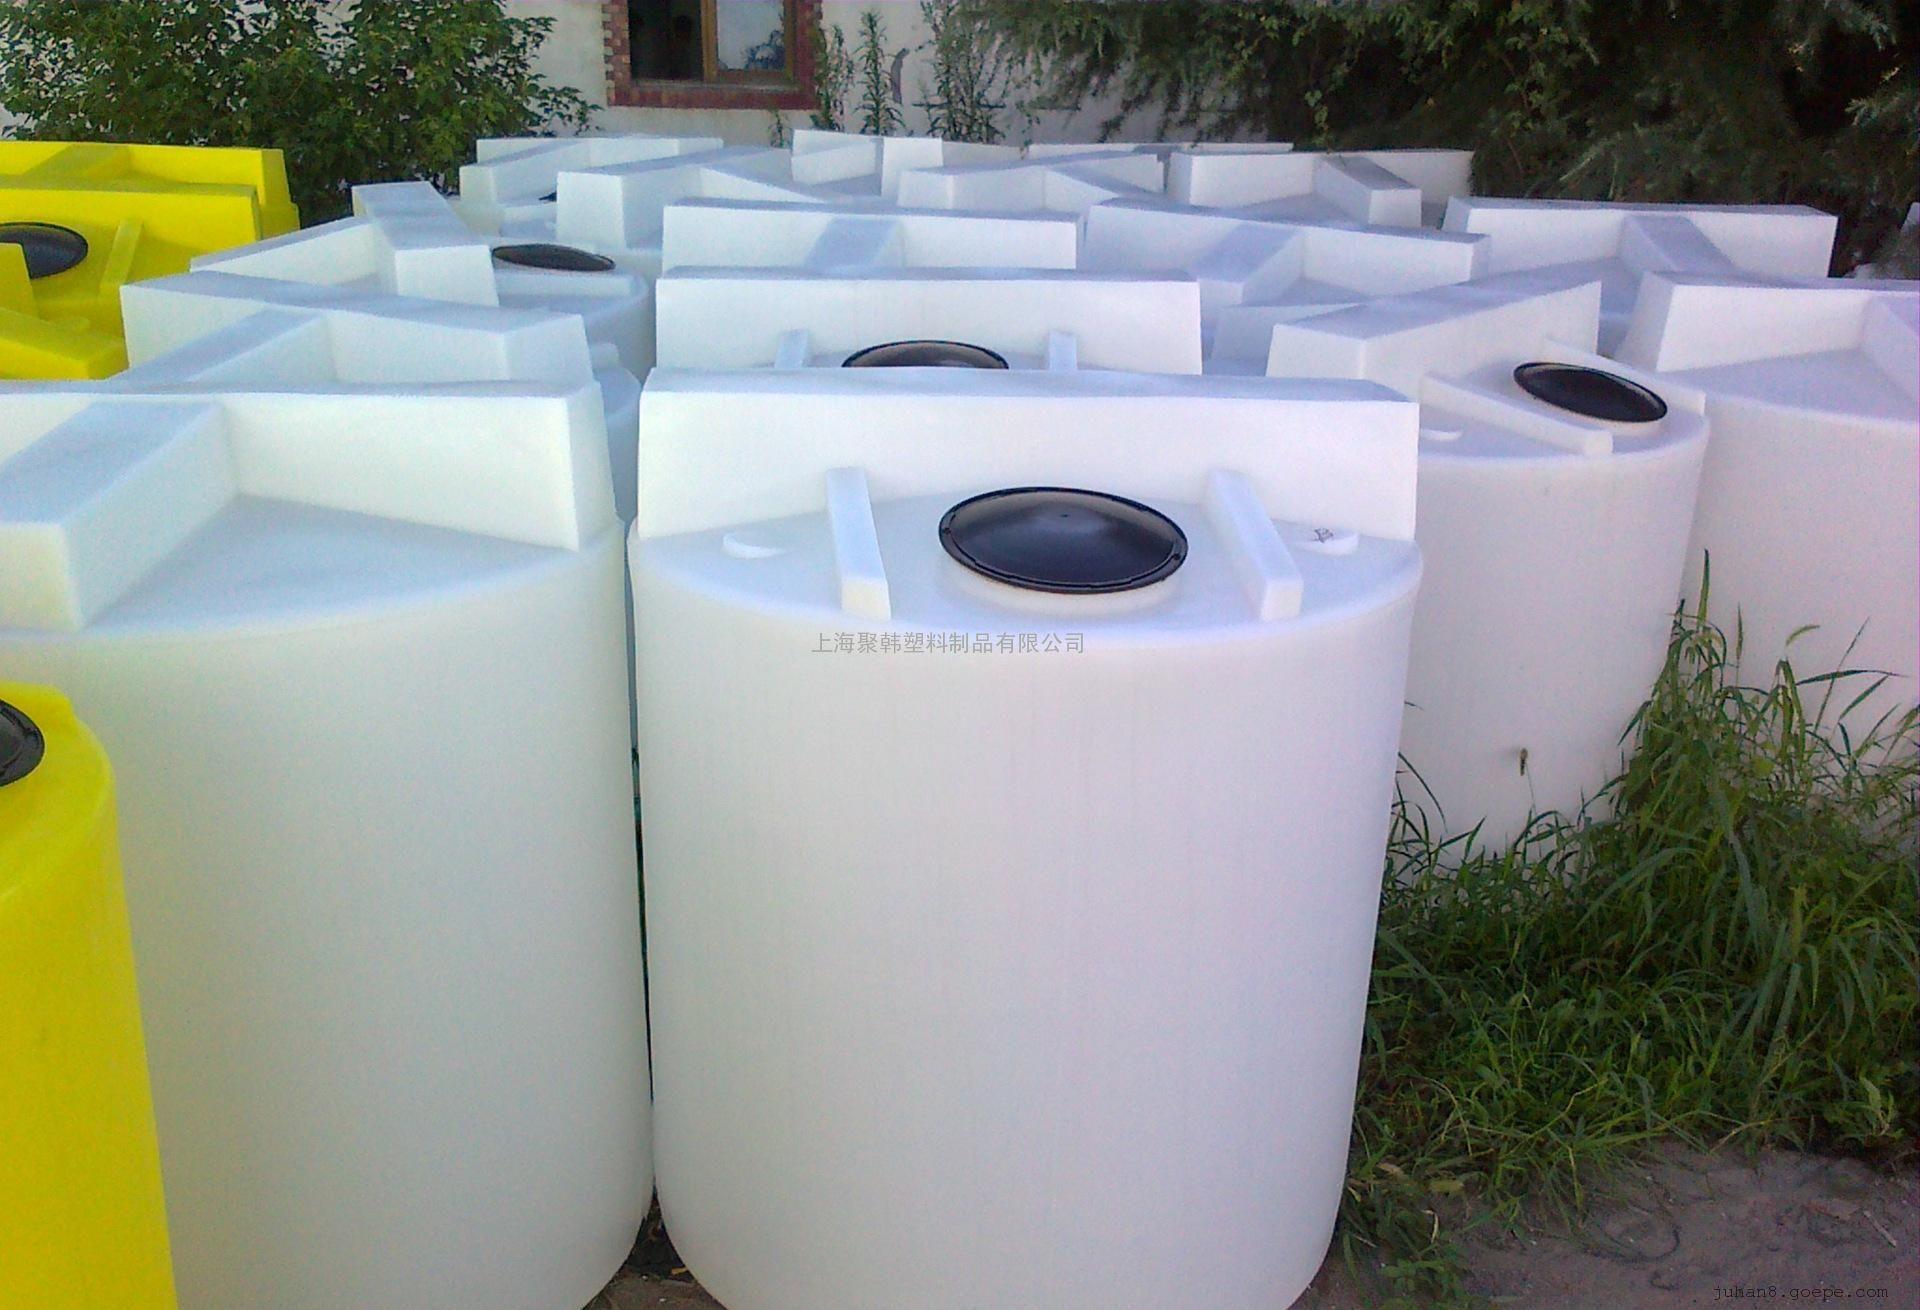 PE水箱|塑料水箱|耐酸碱储罐|加药箱|加药箱装置|聚羧酸复配储罐|塑料桶|塑料方桶|活鱼桶|塑料圆桶|食品储罐|塑料渔船|塑料船|塑料垃圾桶等